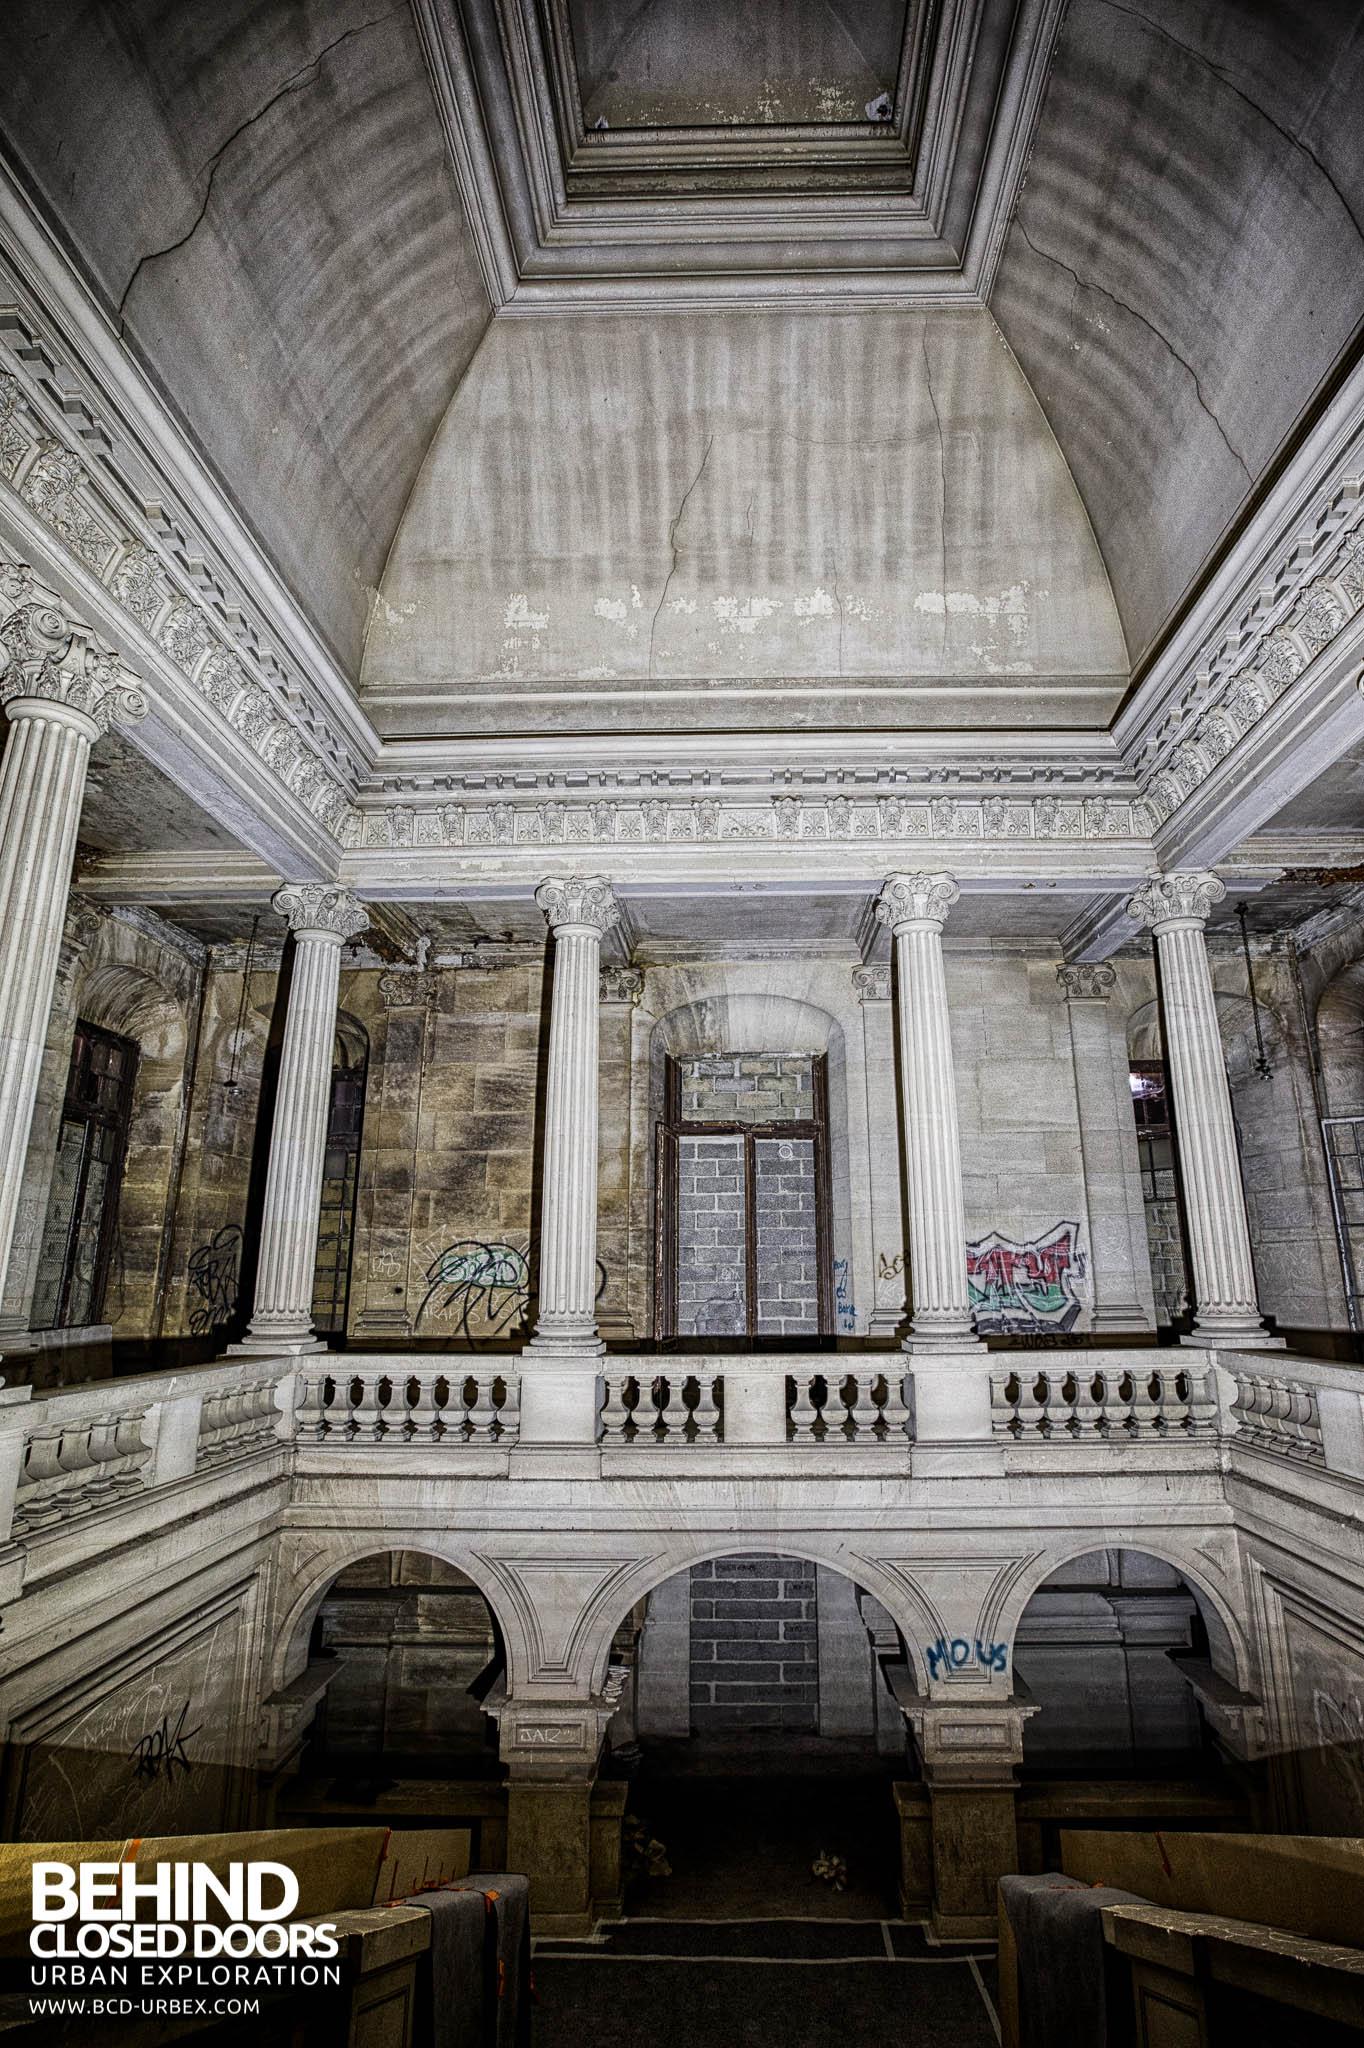 ch teau de carnelle france urbex behind closed doors urban exploring abandoned locations. Black Bedroom Furniture Sets. Home Design Ideas